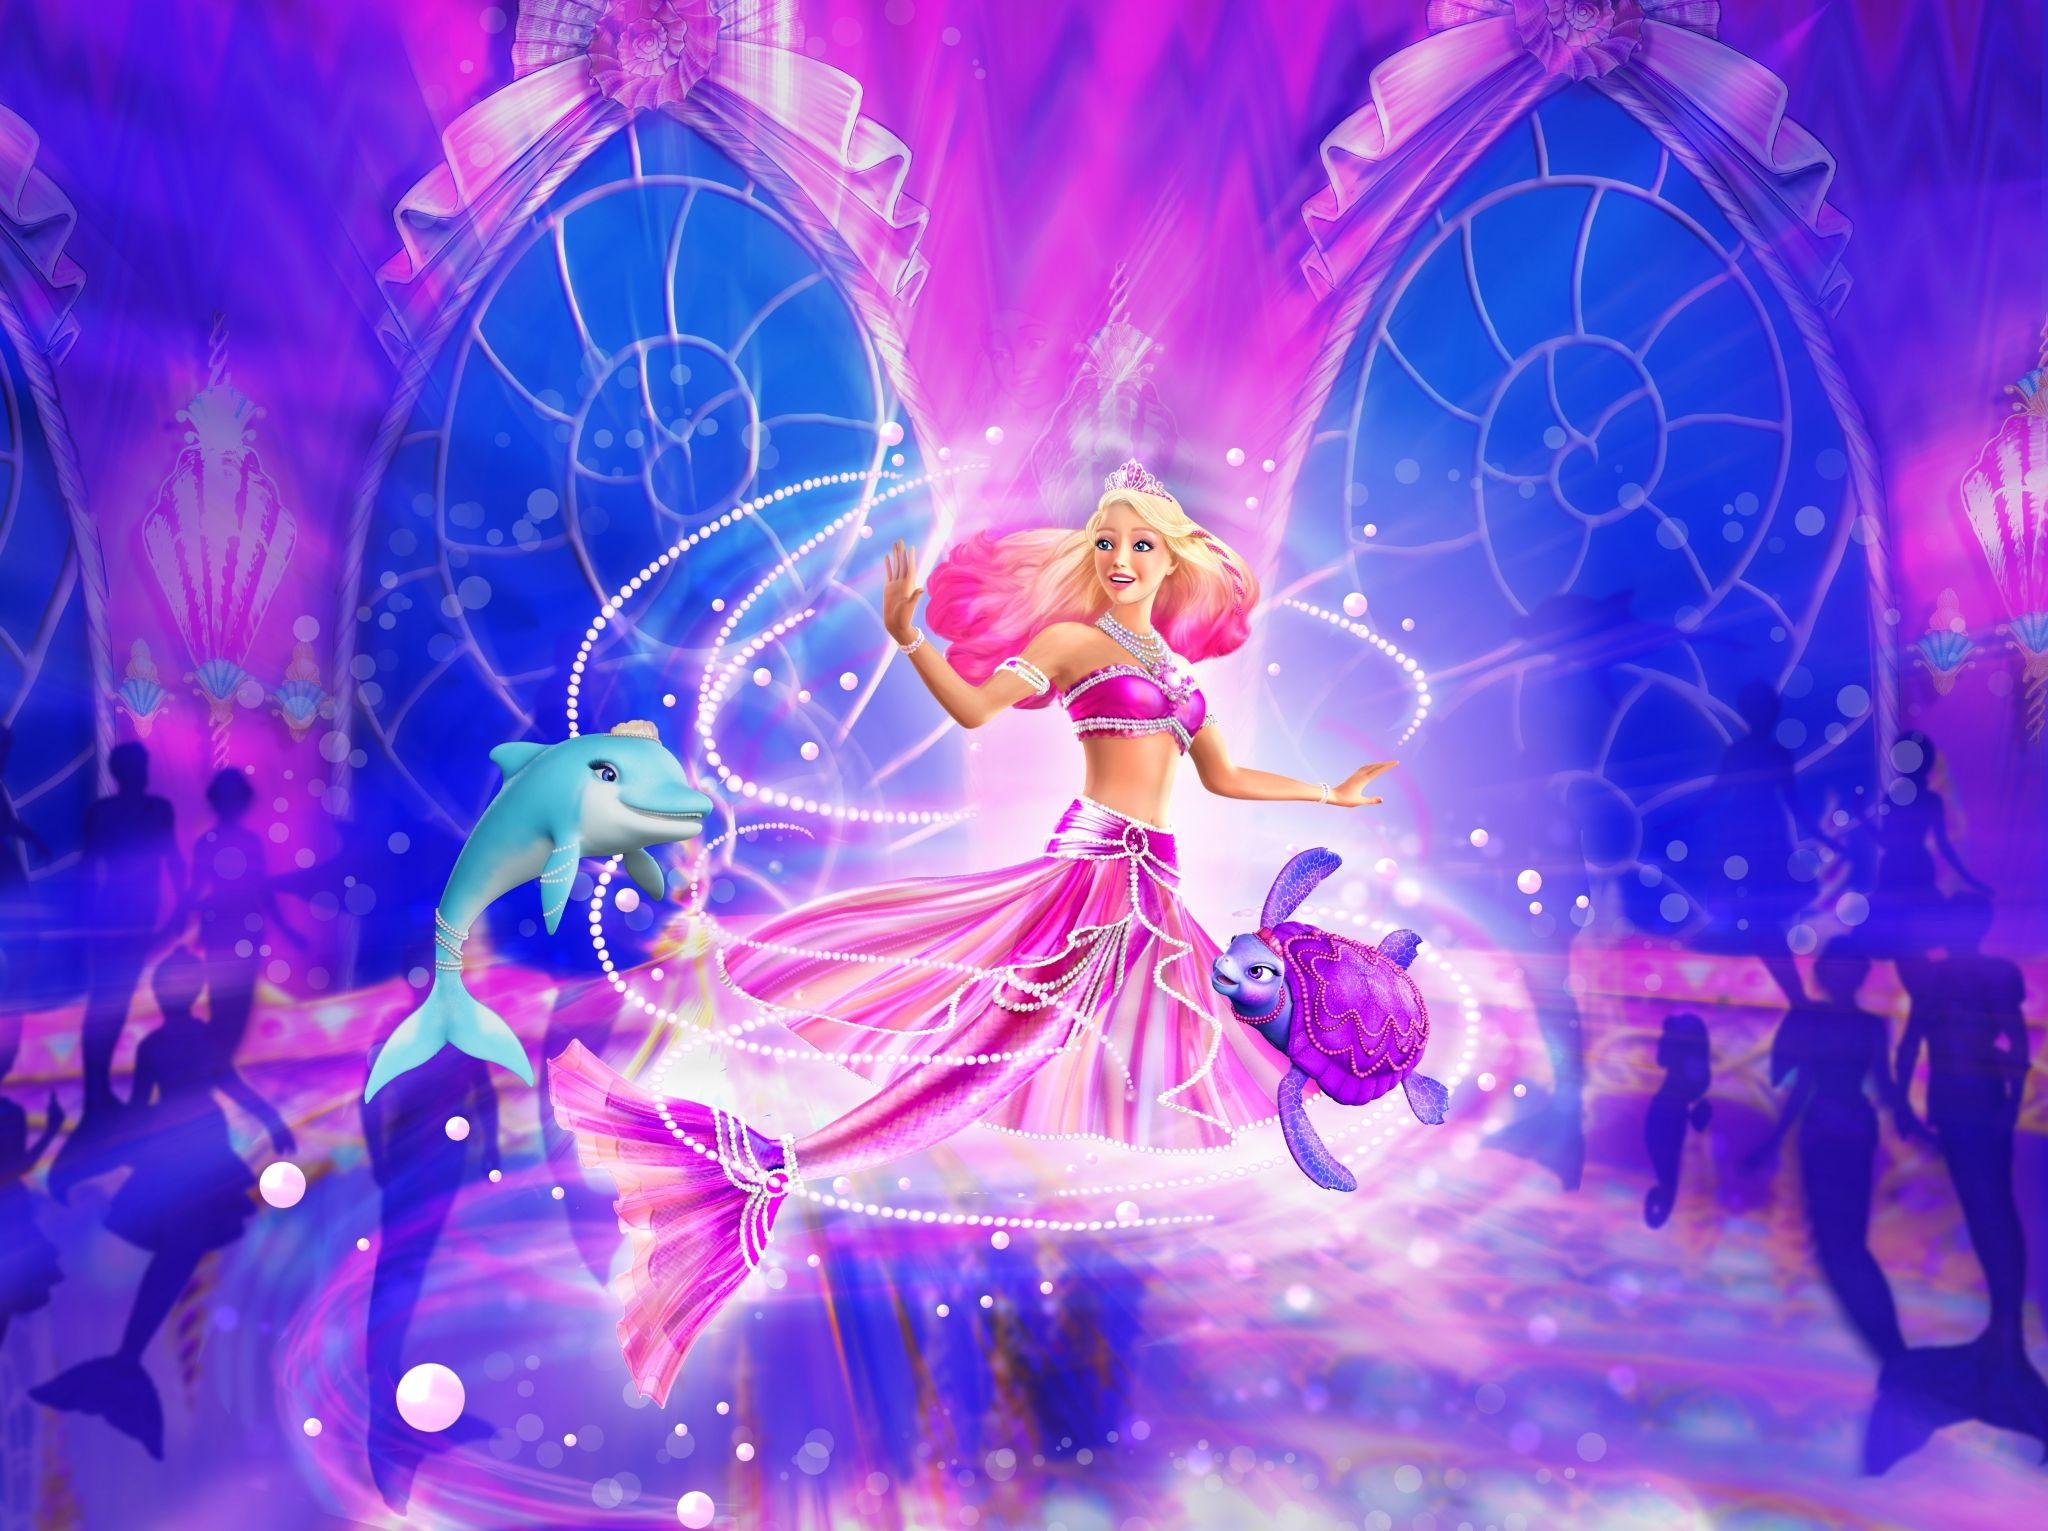 Barbie Free Computer Wallpaper Download Barbie Movies Princess